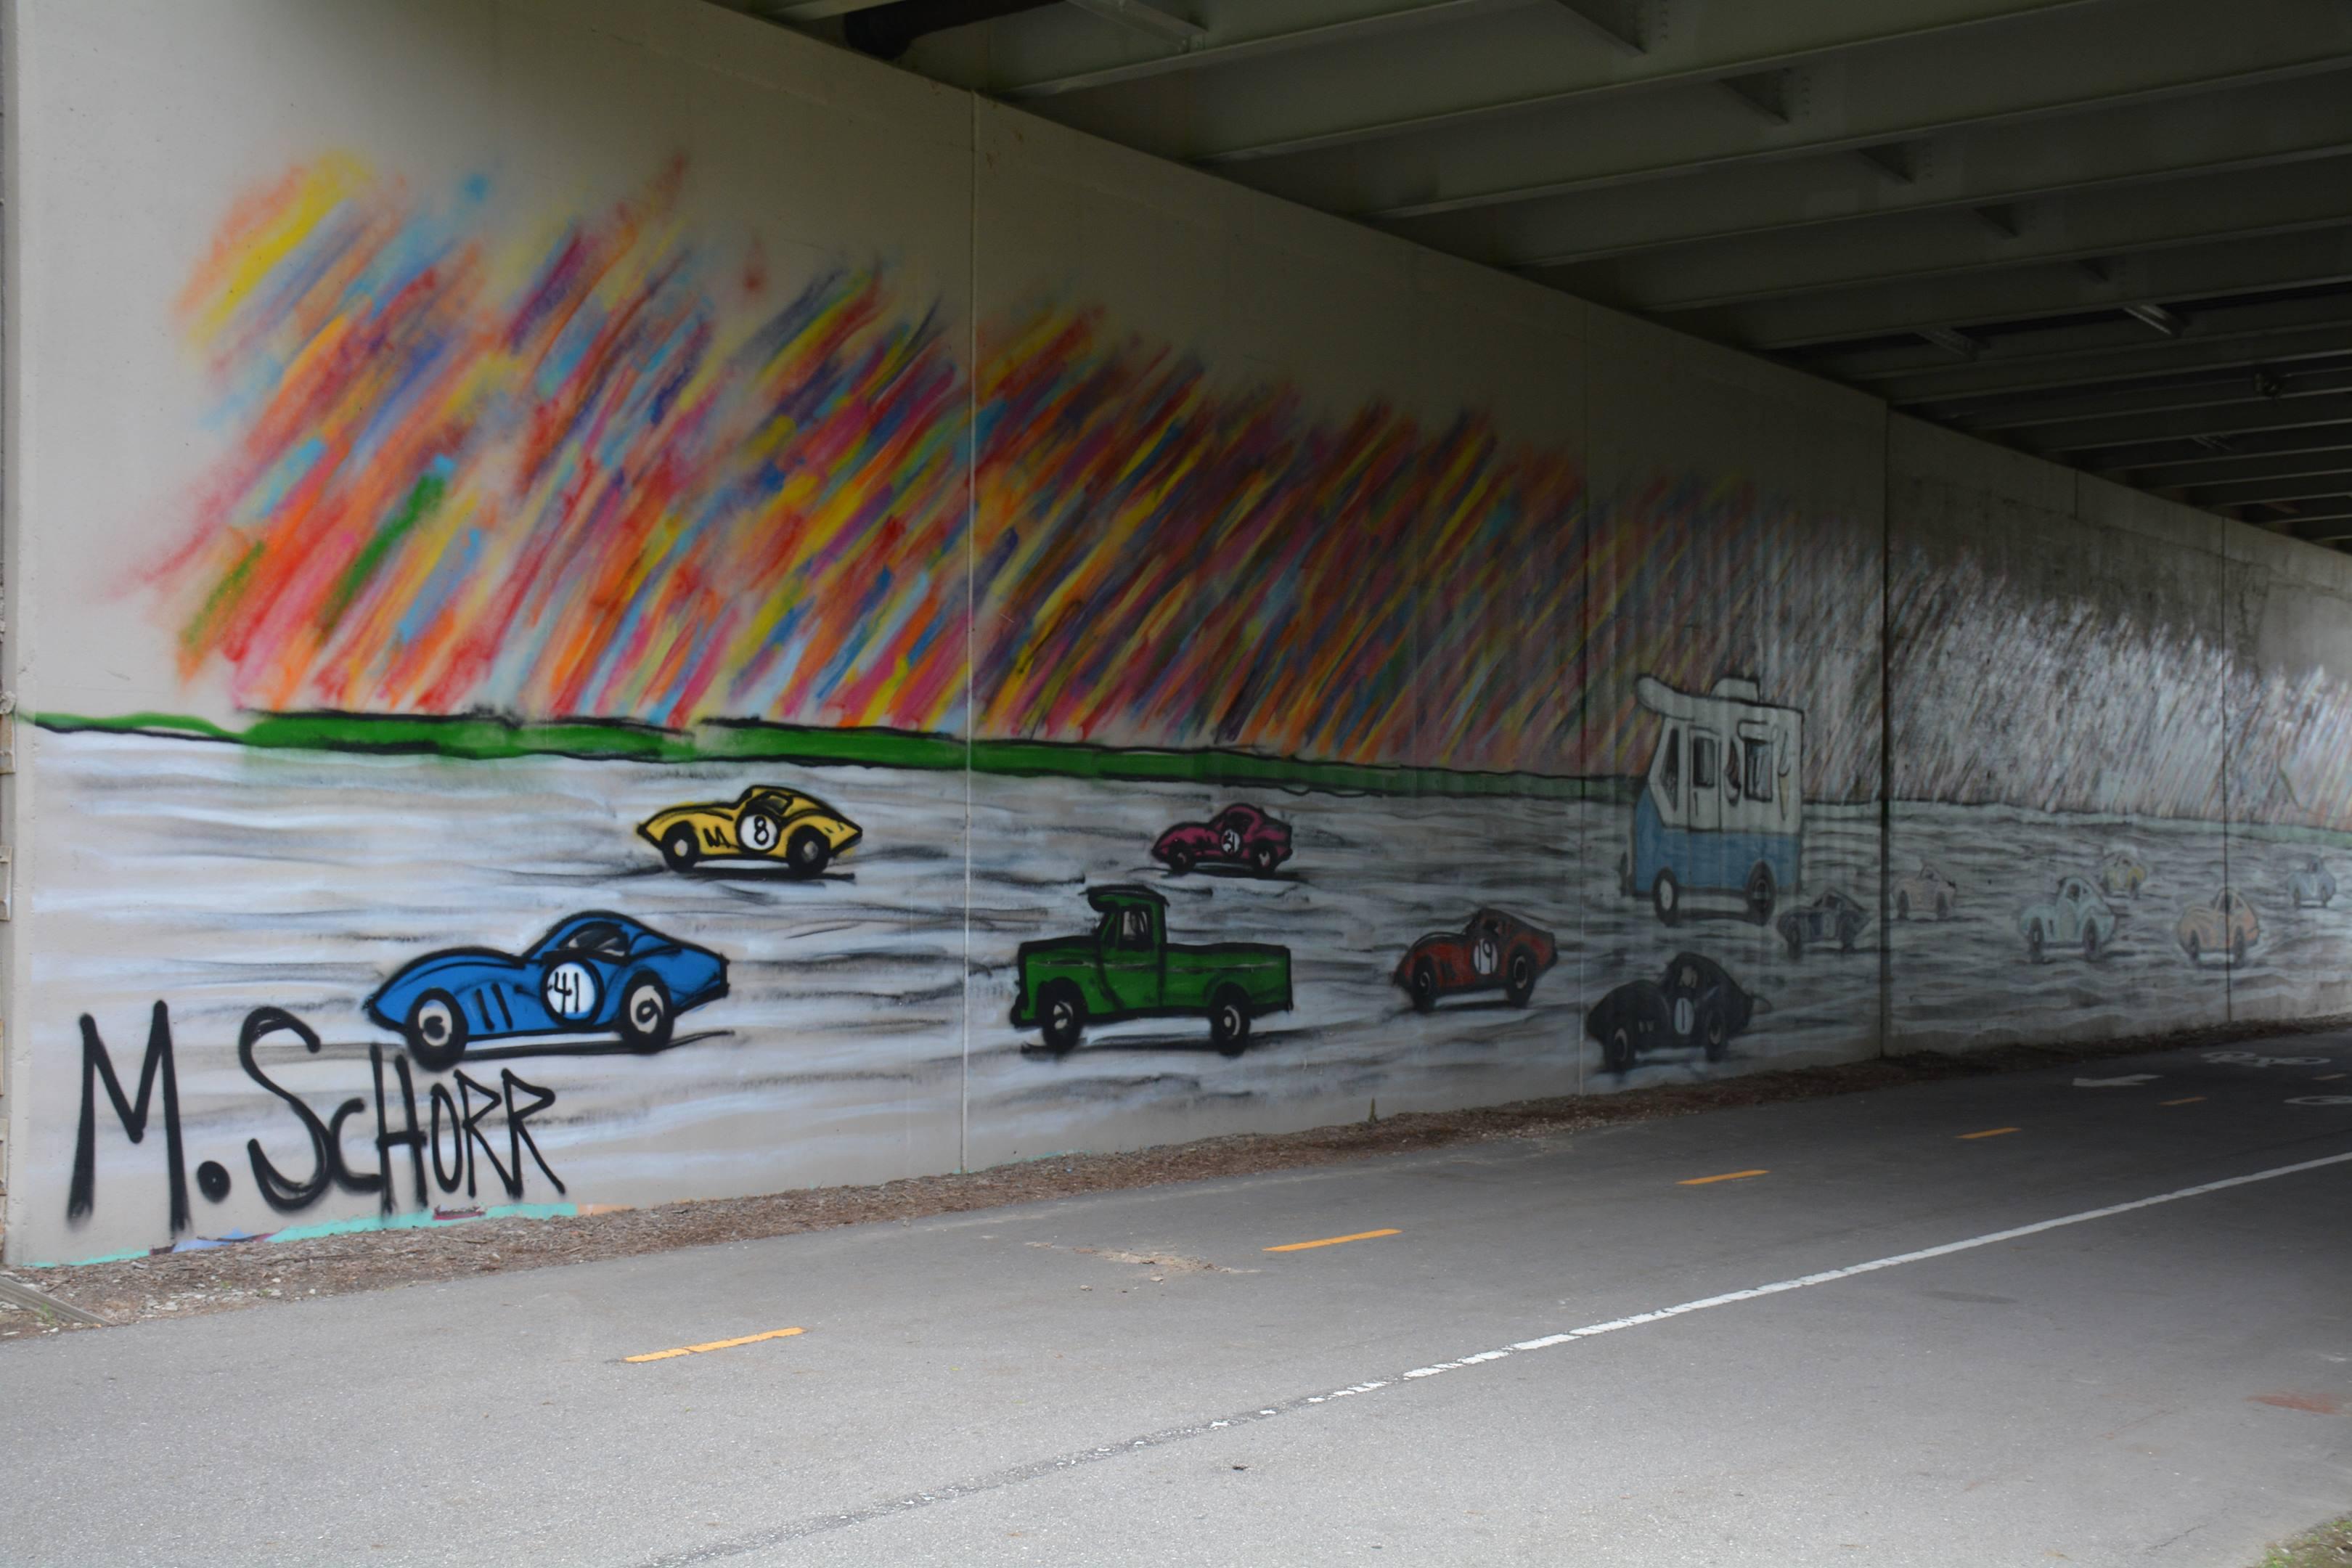 Race cars, ice cream trucks, and street art thumbnail